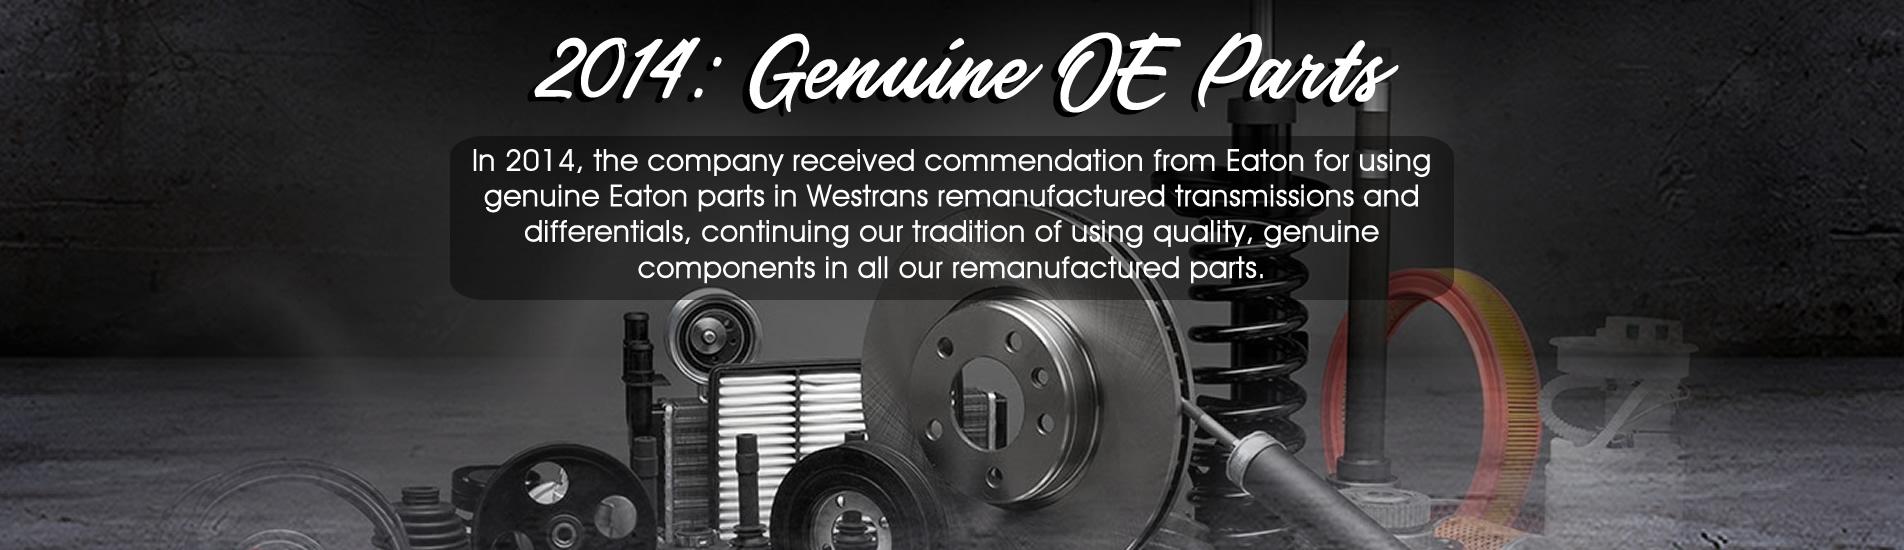 westrans-genuine-parts-2014